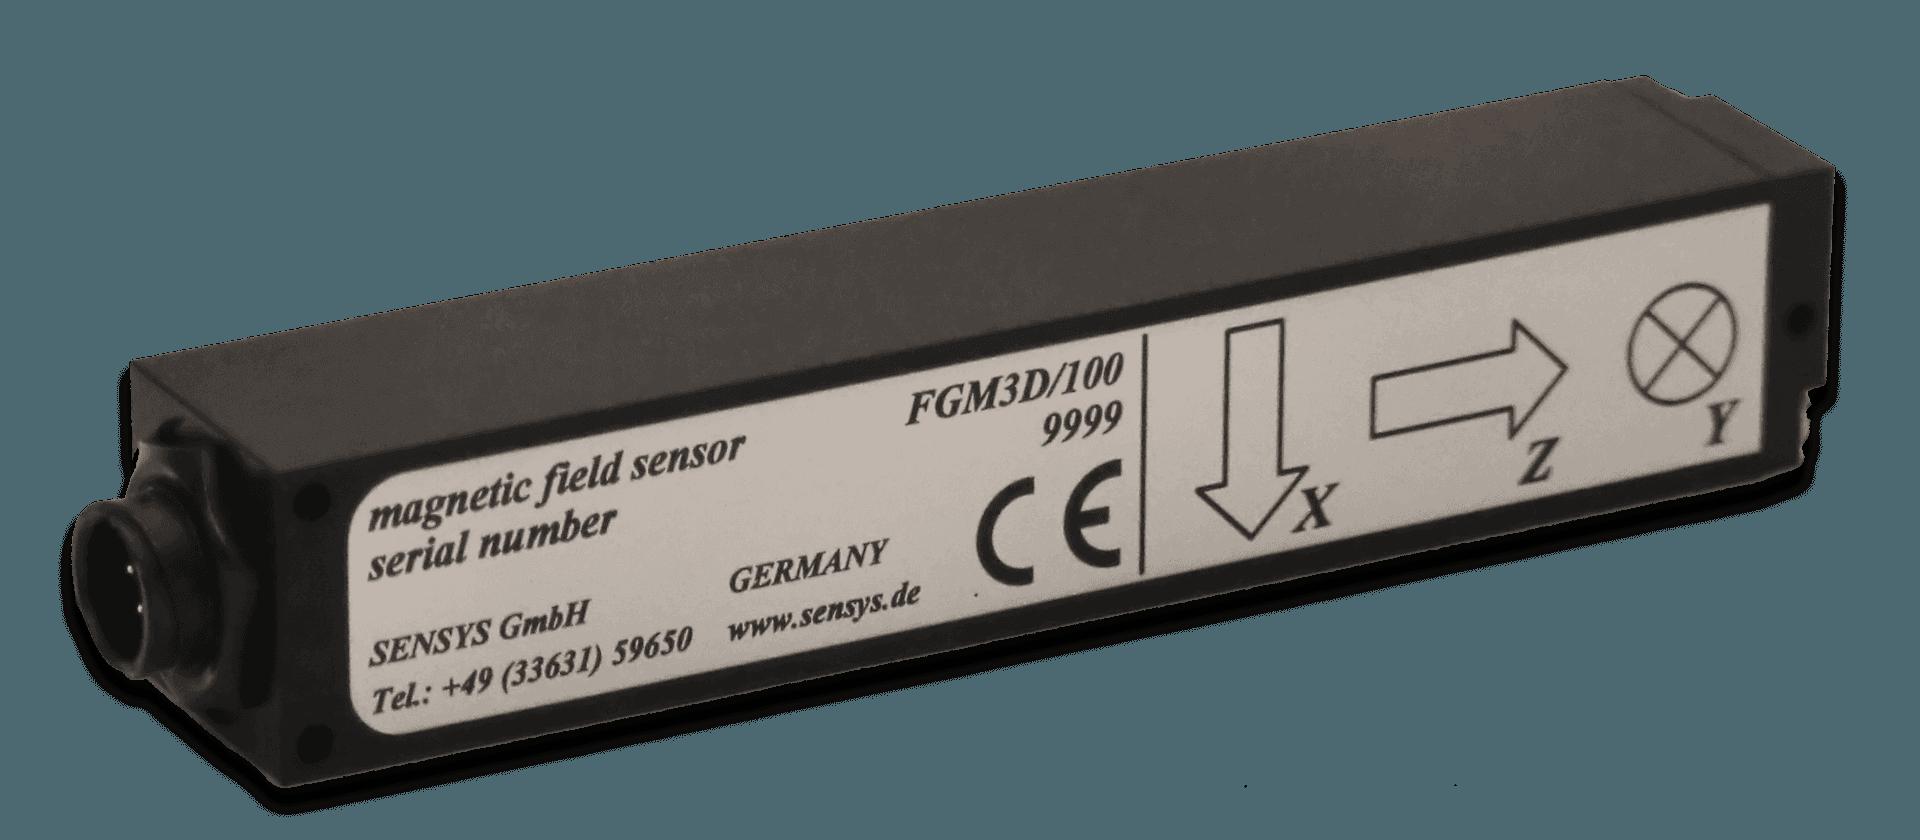 Fluxgate magnetometer sensors